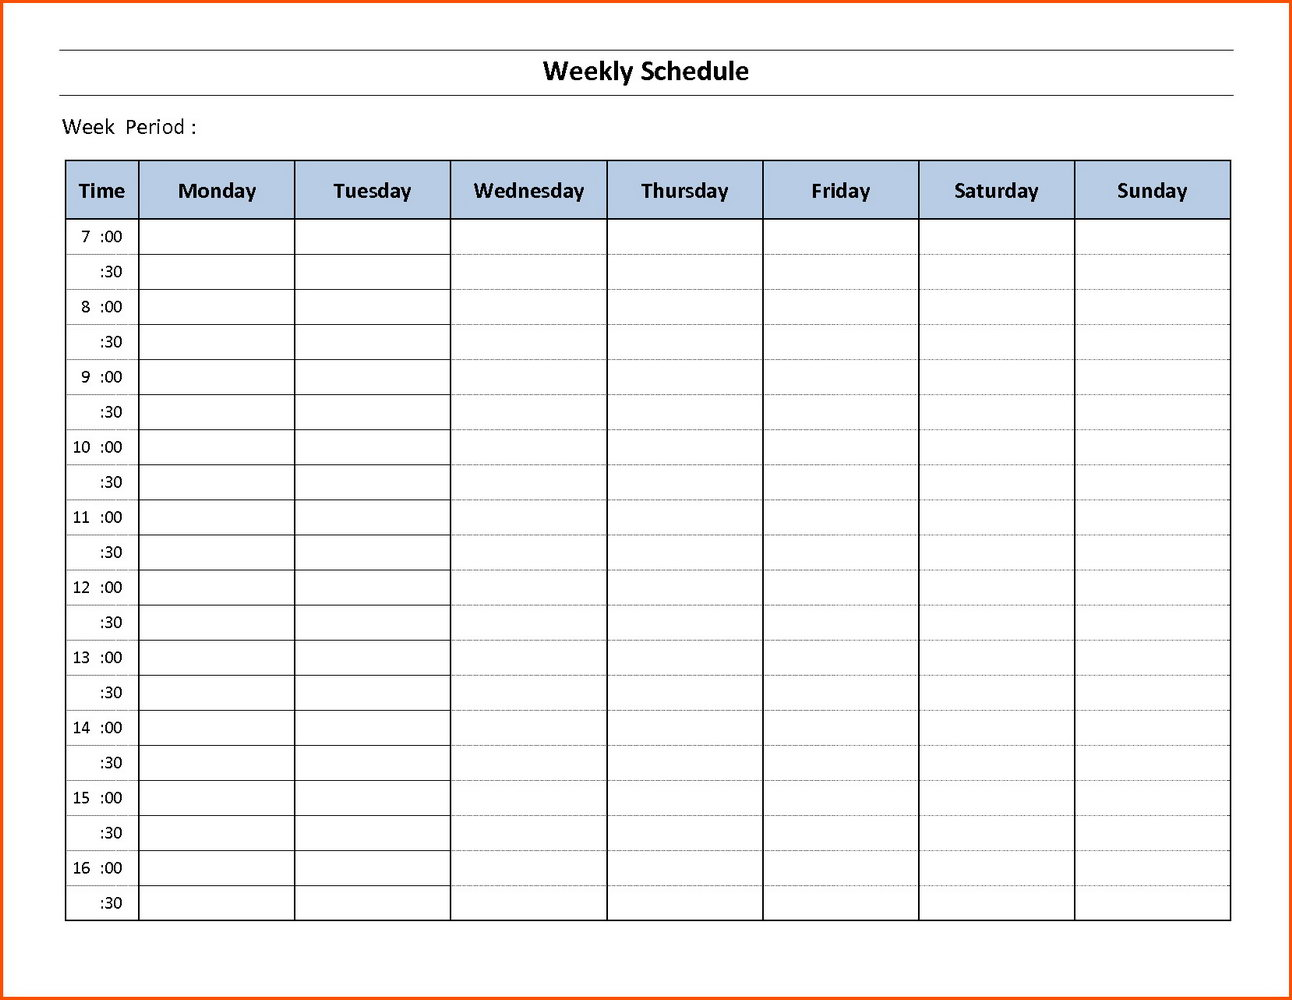 Weekly Employee Schedule Template Free